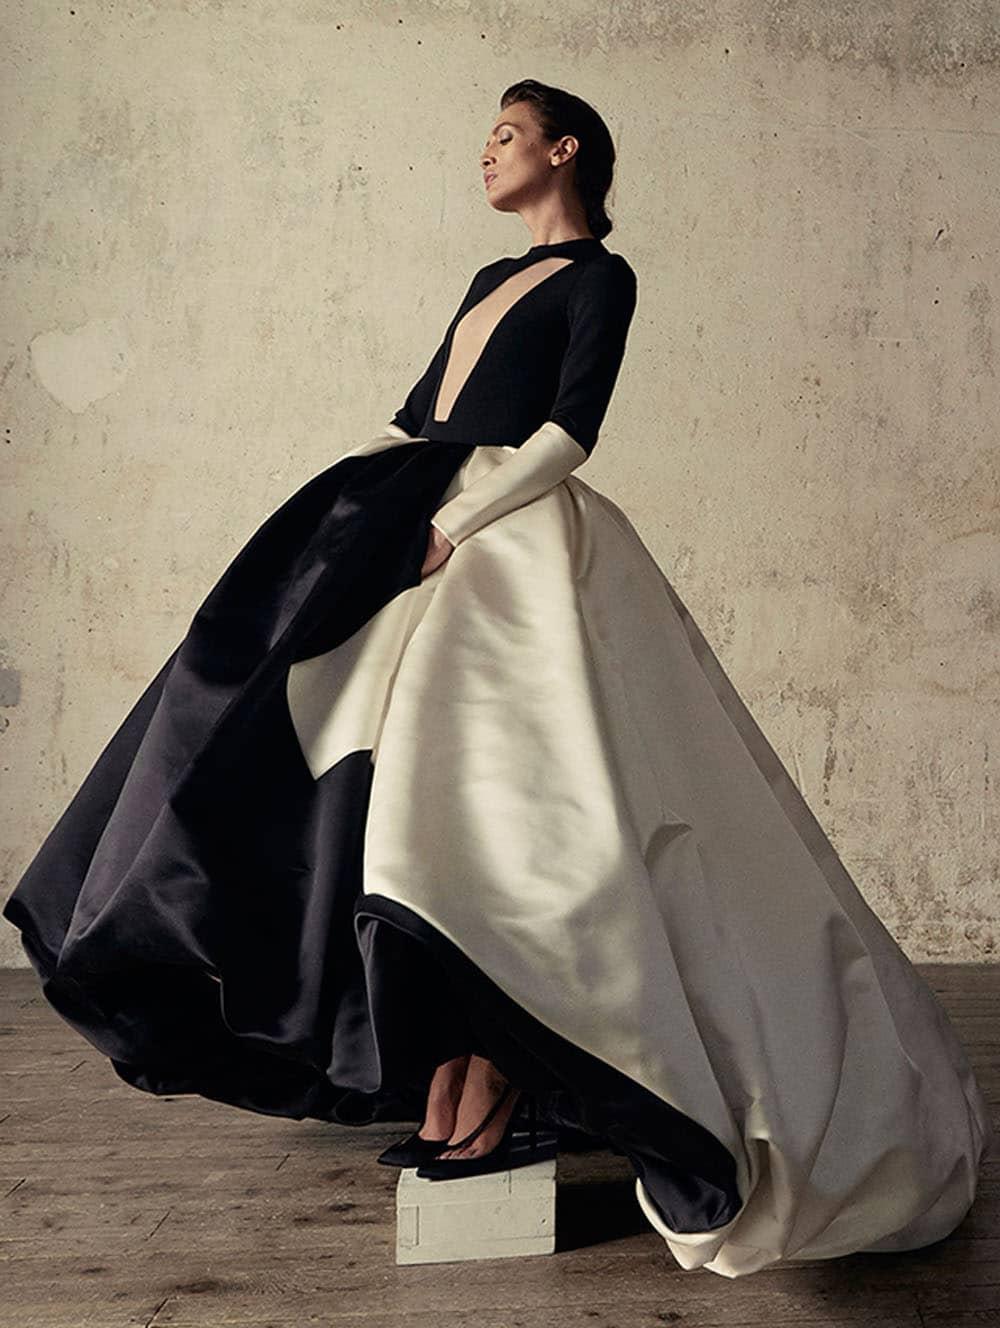 Eniwhere Fashion - S. Rolland 04